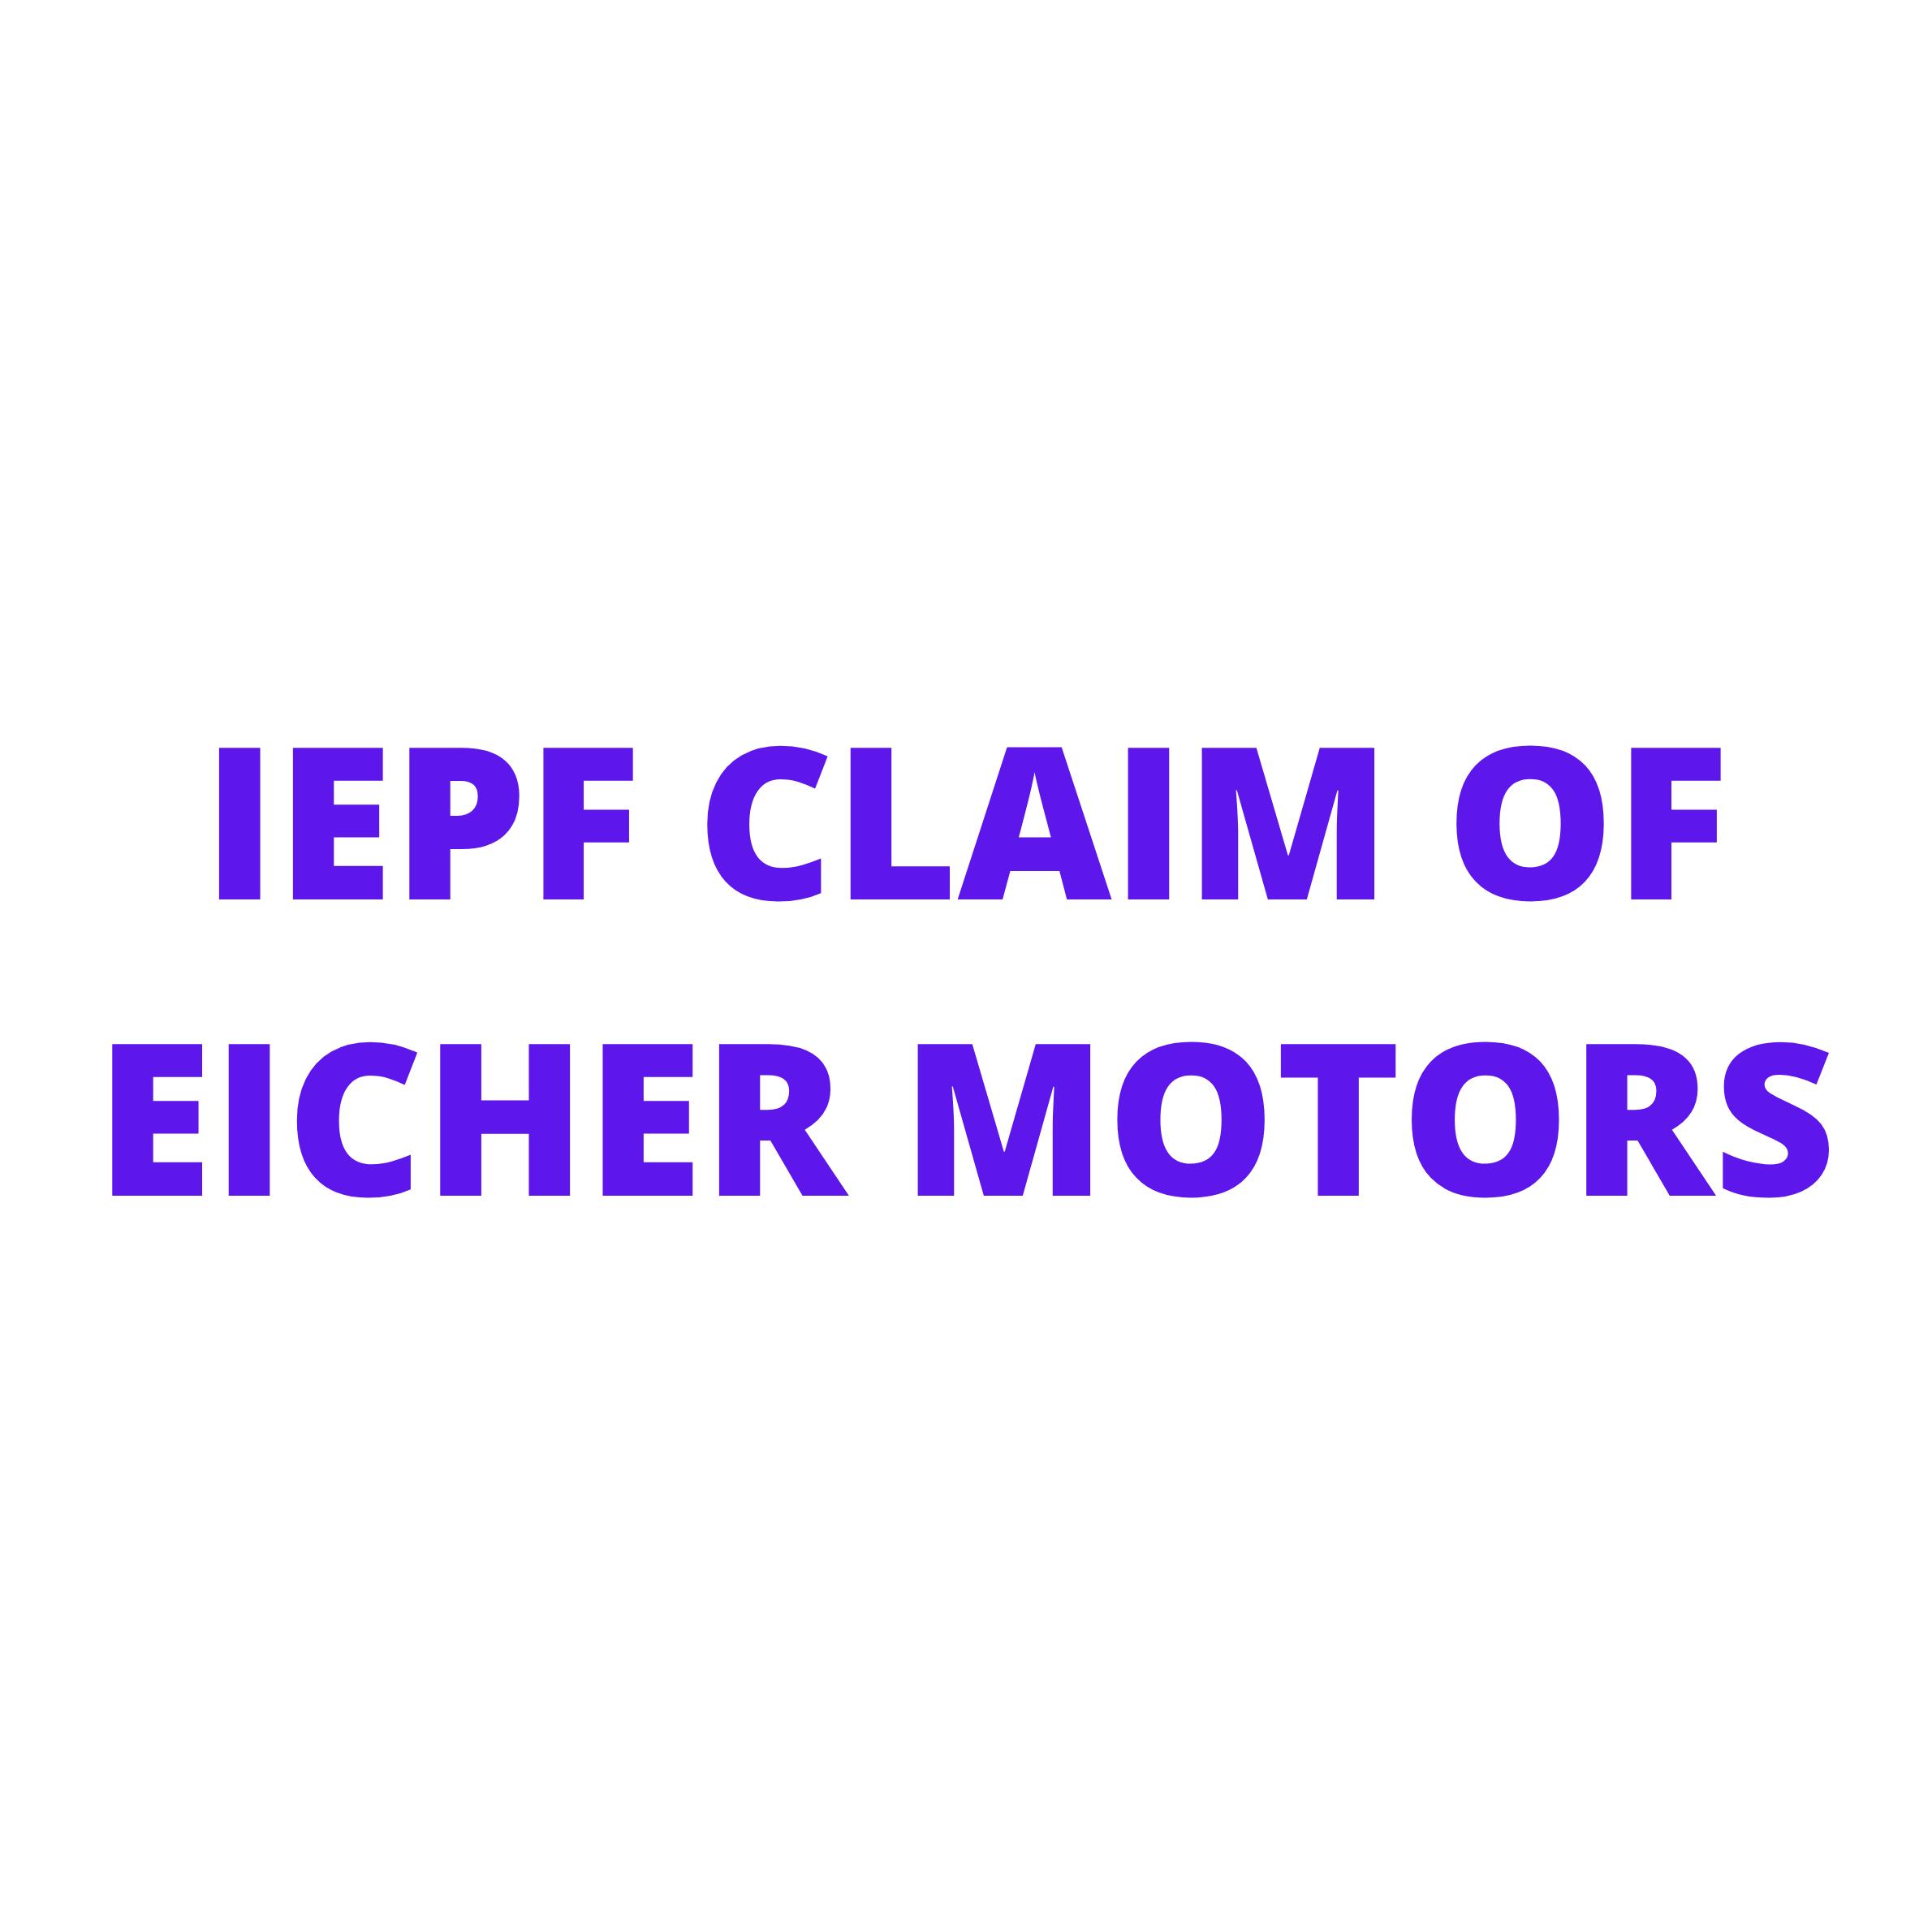 IEPF claim or IEPF refund of EICHER MOTORS LTD shares / unclaimed dividend of EICHER MOTORS LTD shares- Know All Details